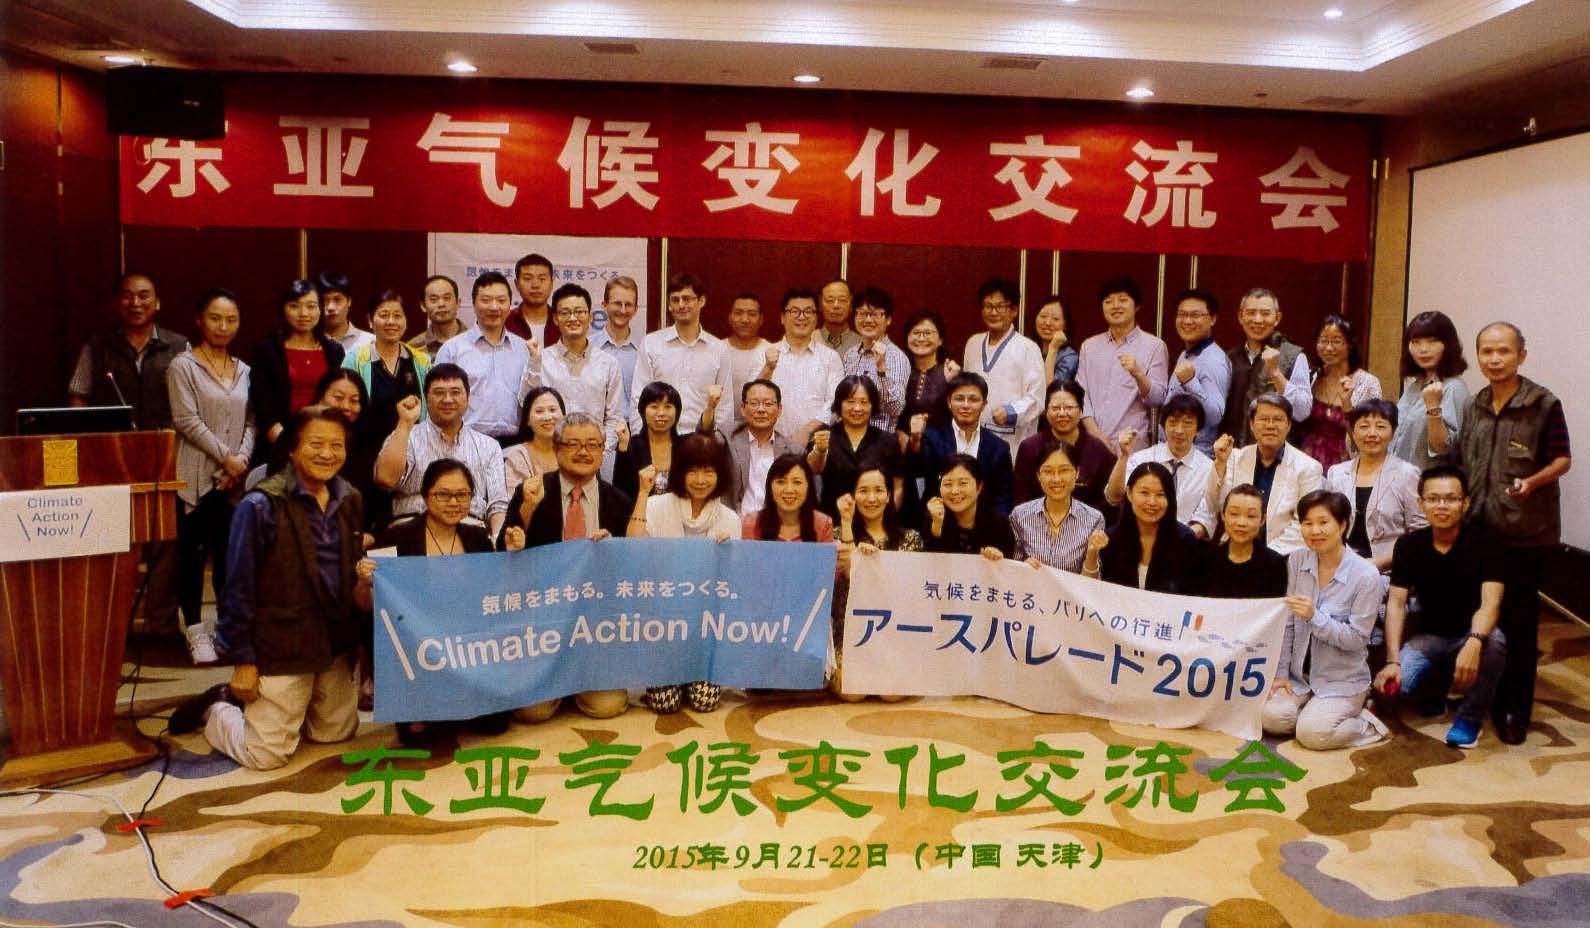 20150921_EastAsiaClimateForum